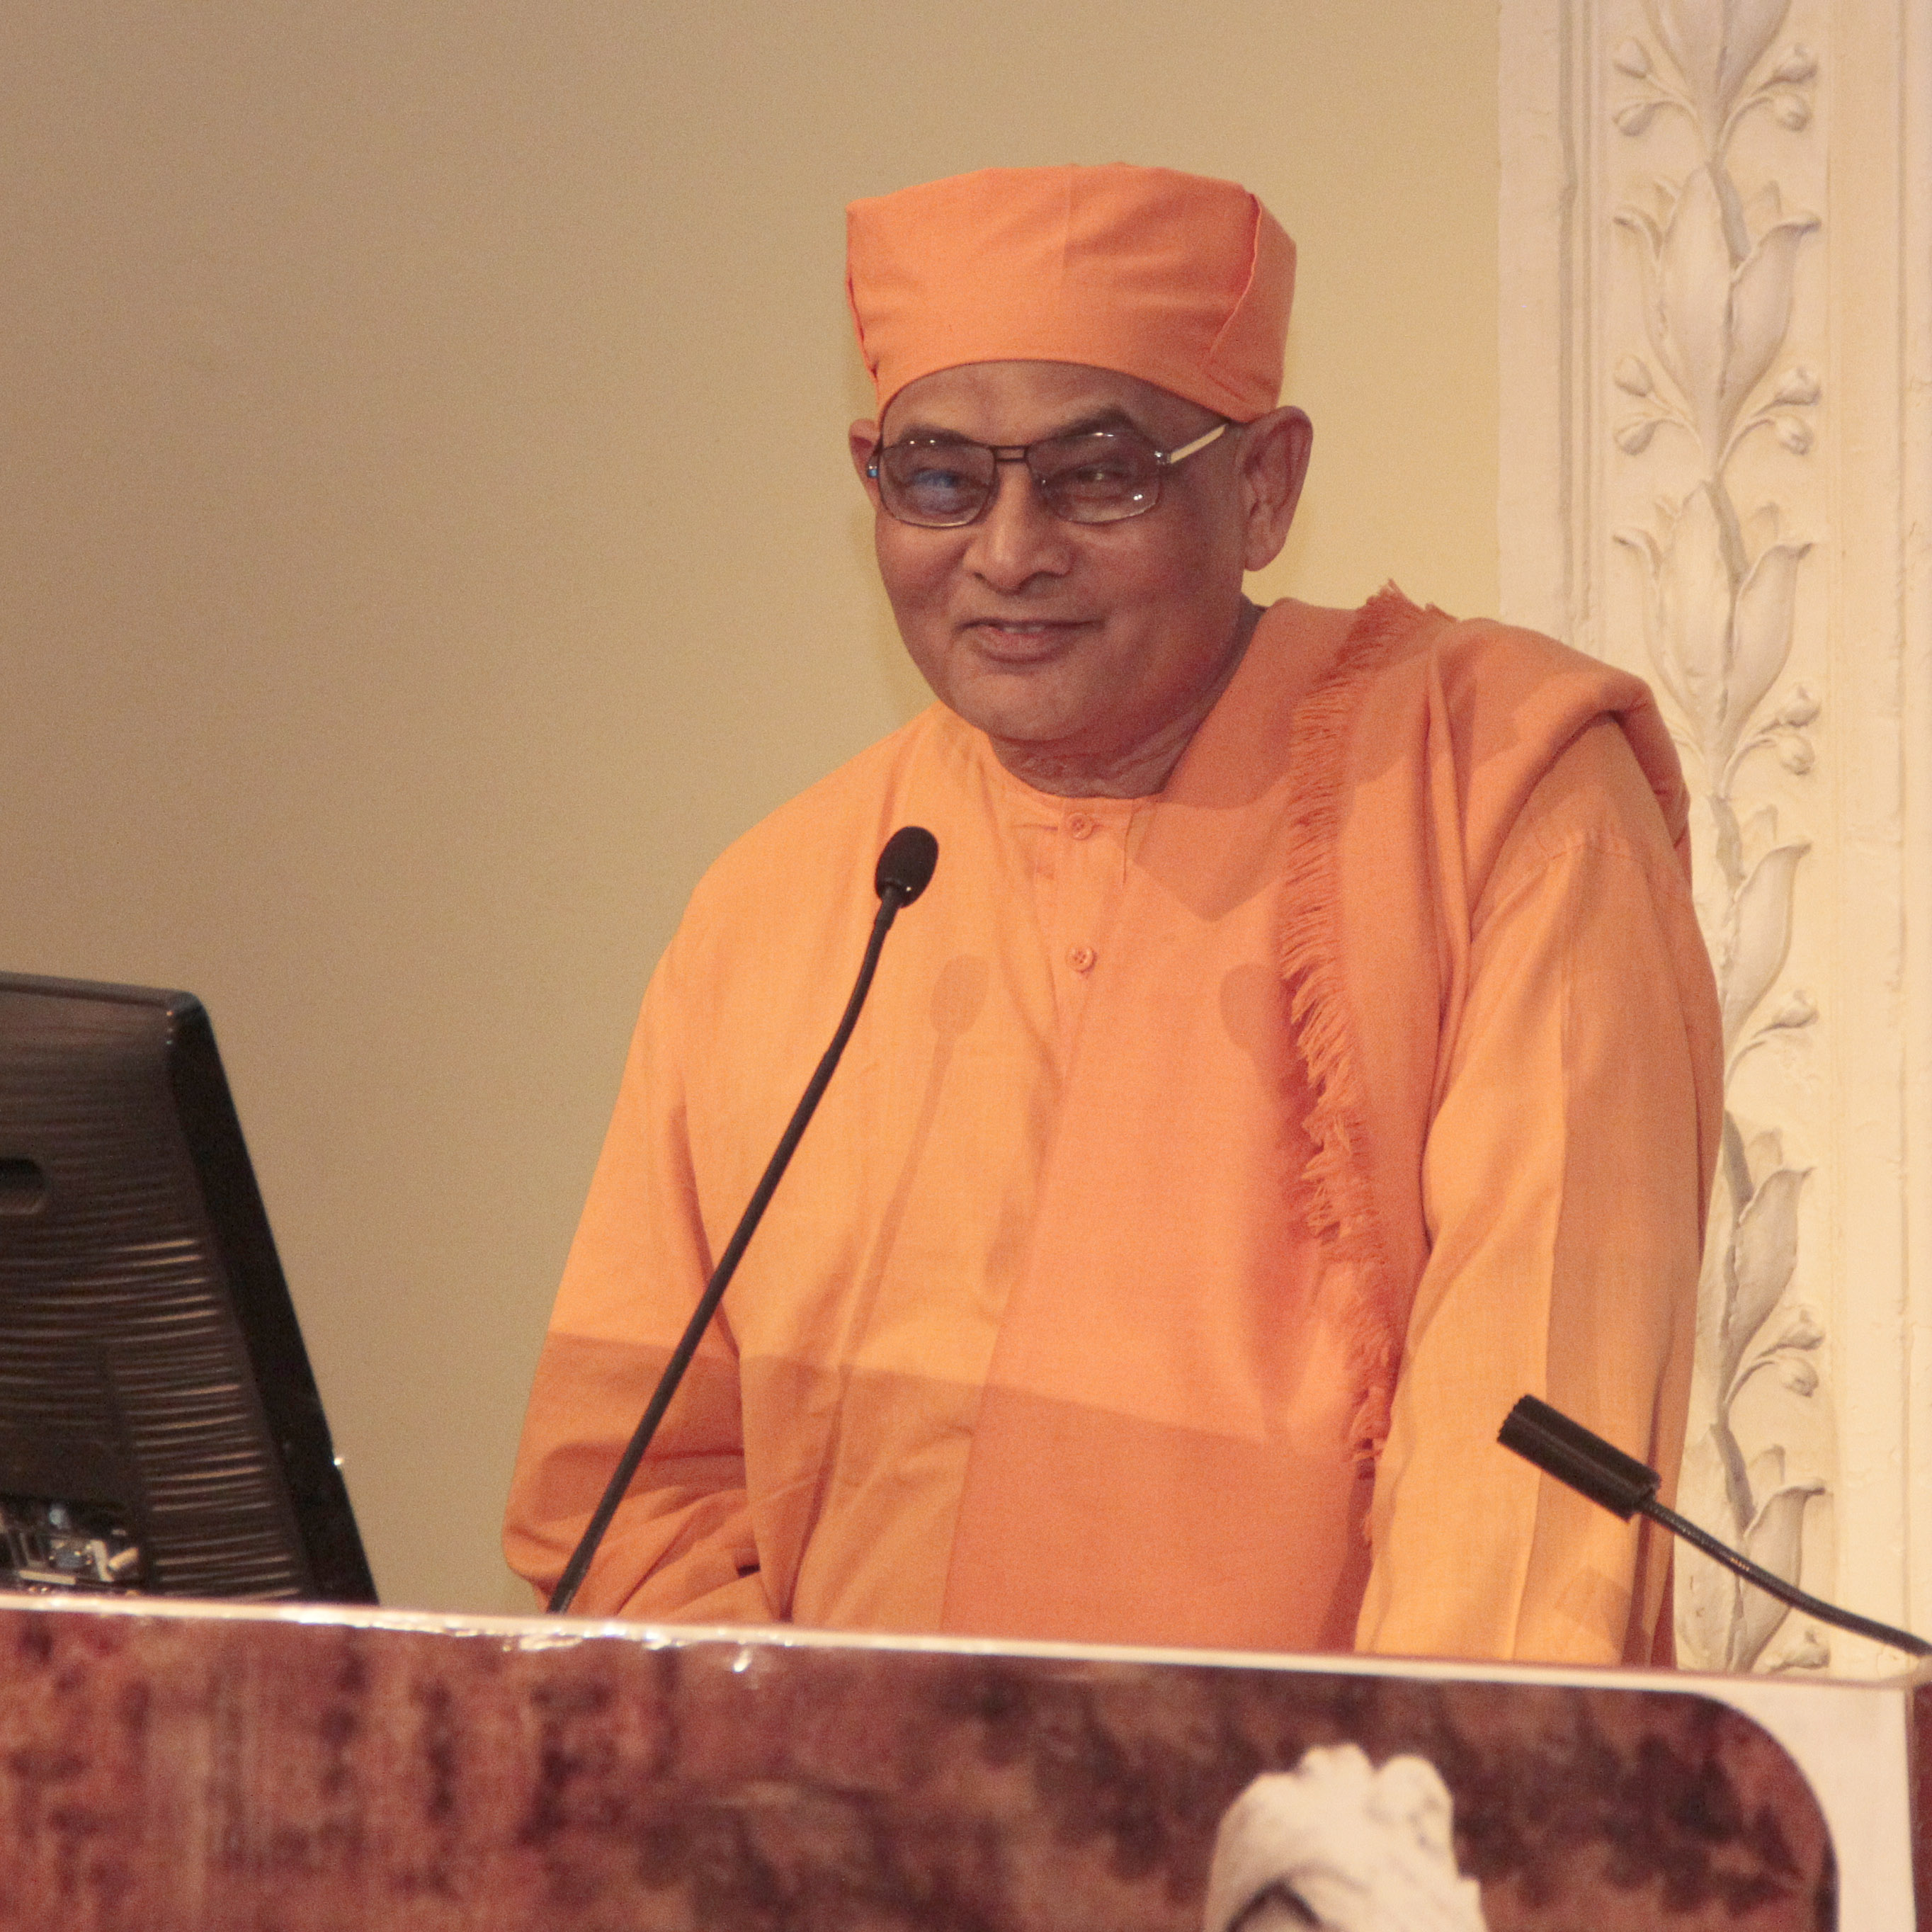 Swami Nikhileshwarananda